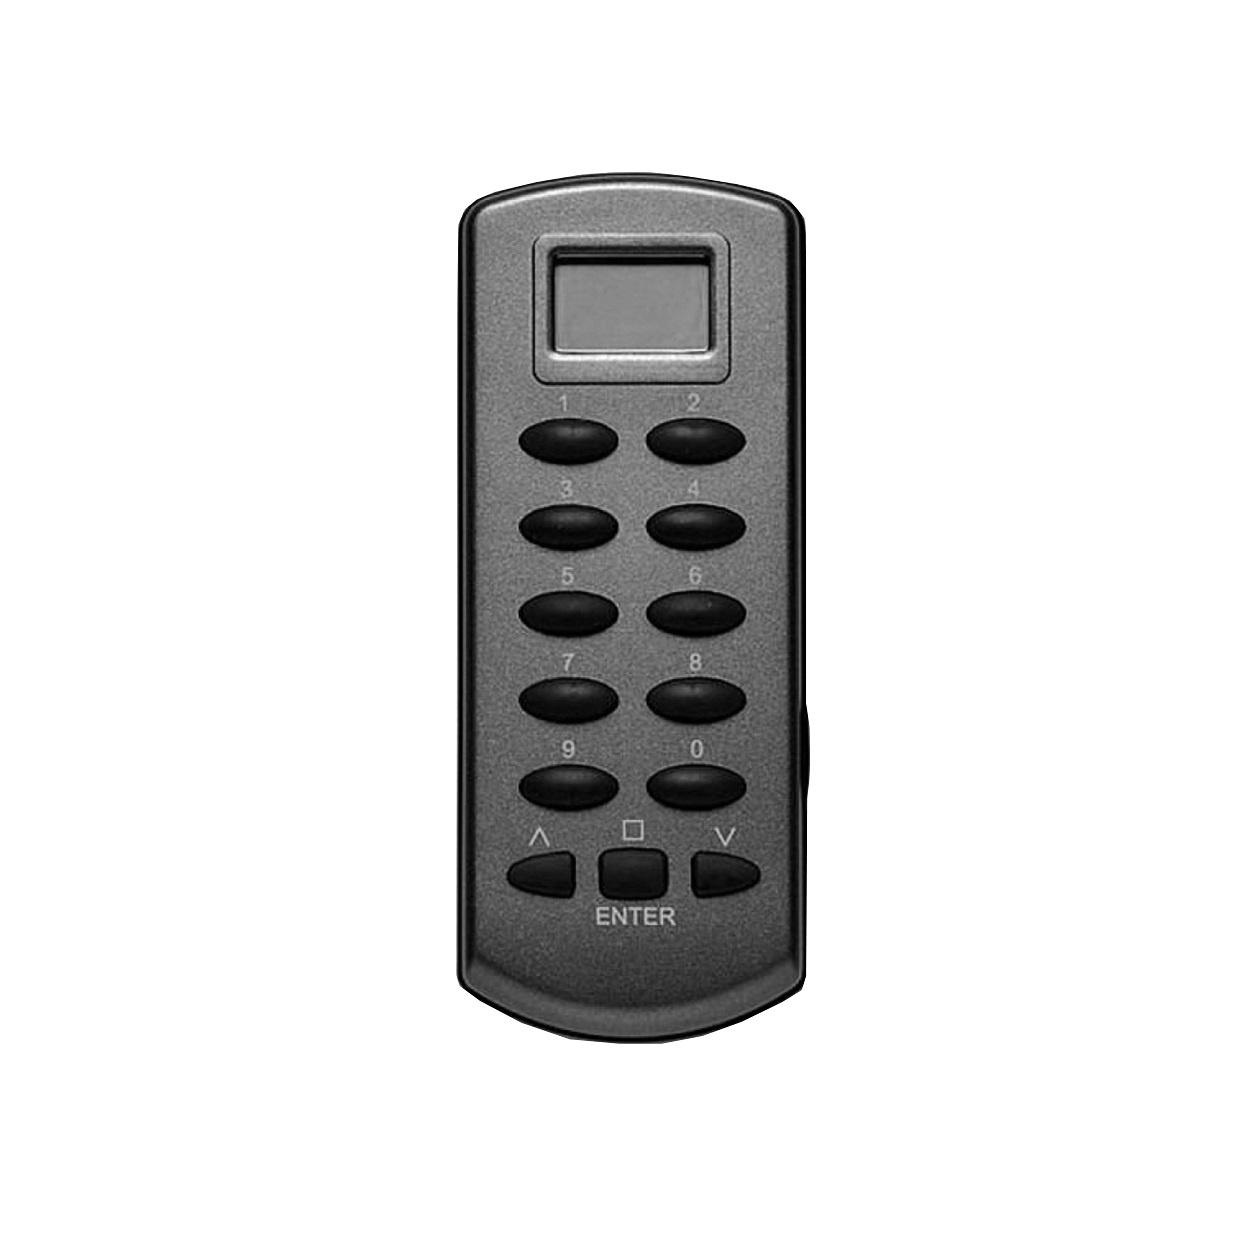 Marantec Digital 318 multi-bit 868 MHz - 999 kanaals handzender